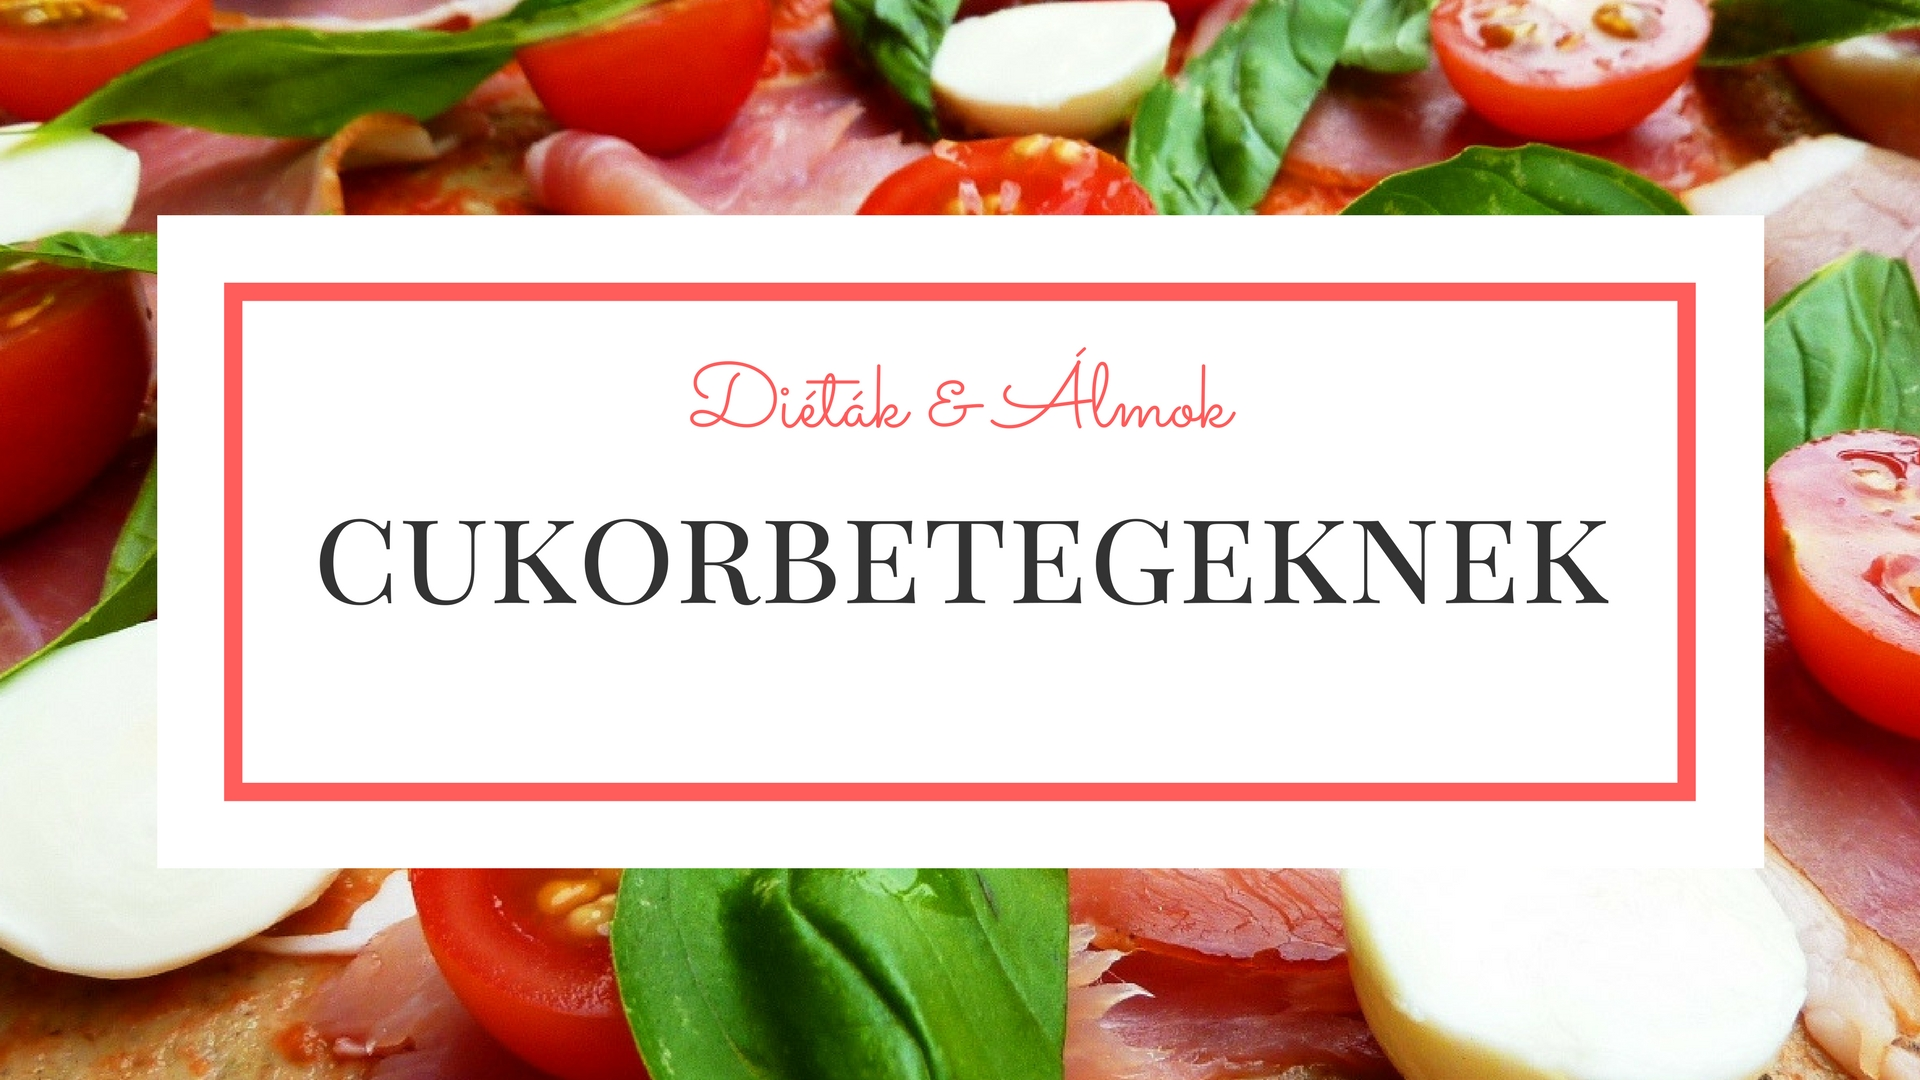 dietak_almok_szenhidrat_dieta_tanfolyamok_cukorbetegeknek_blog.jpg